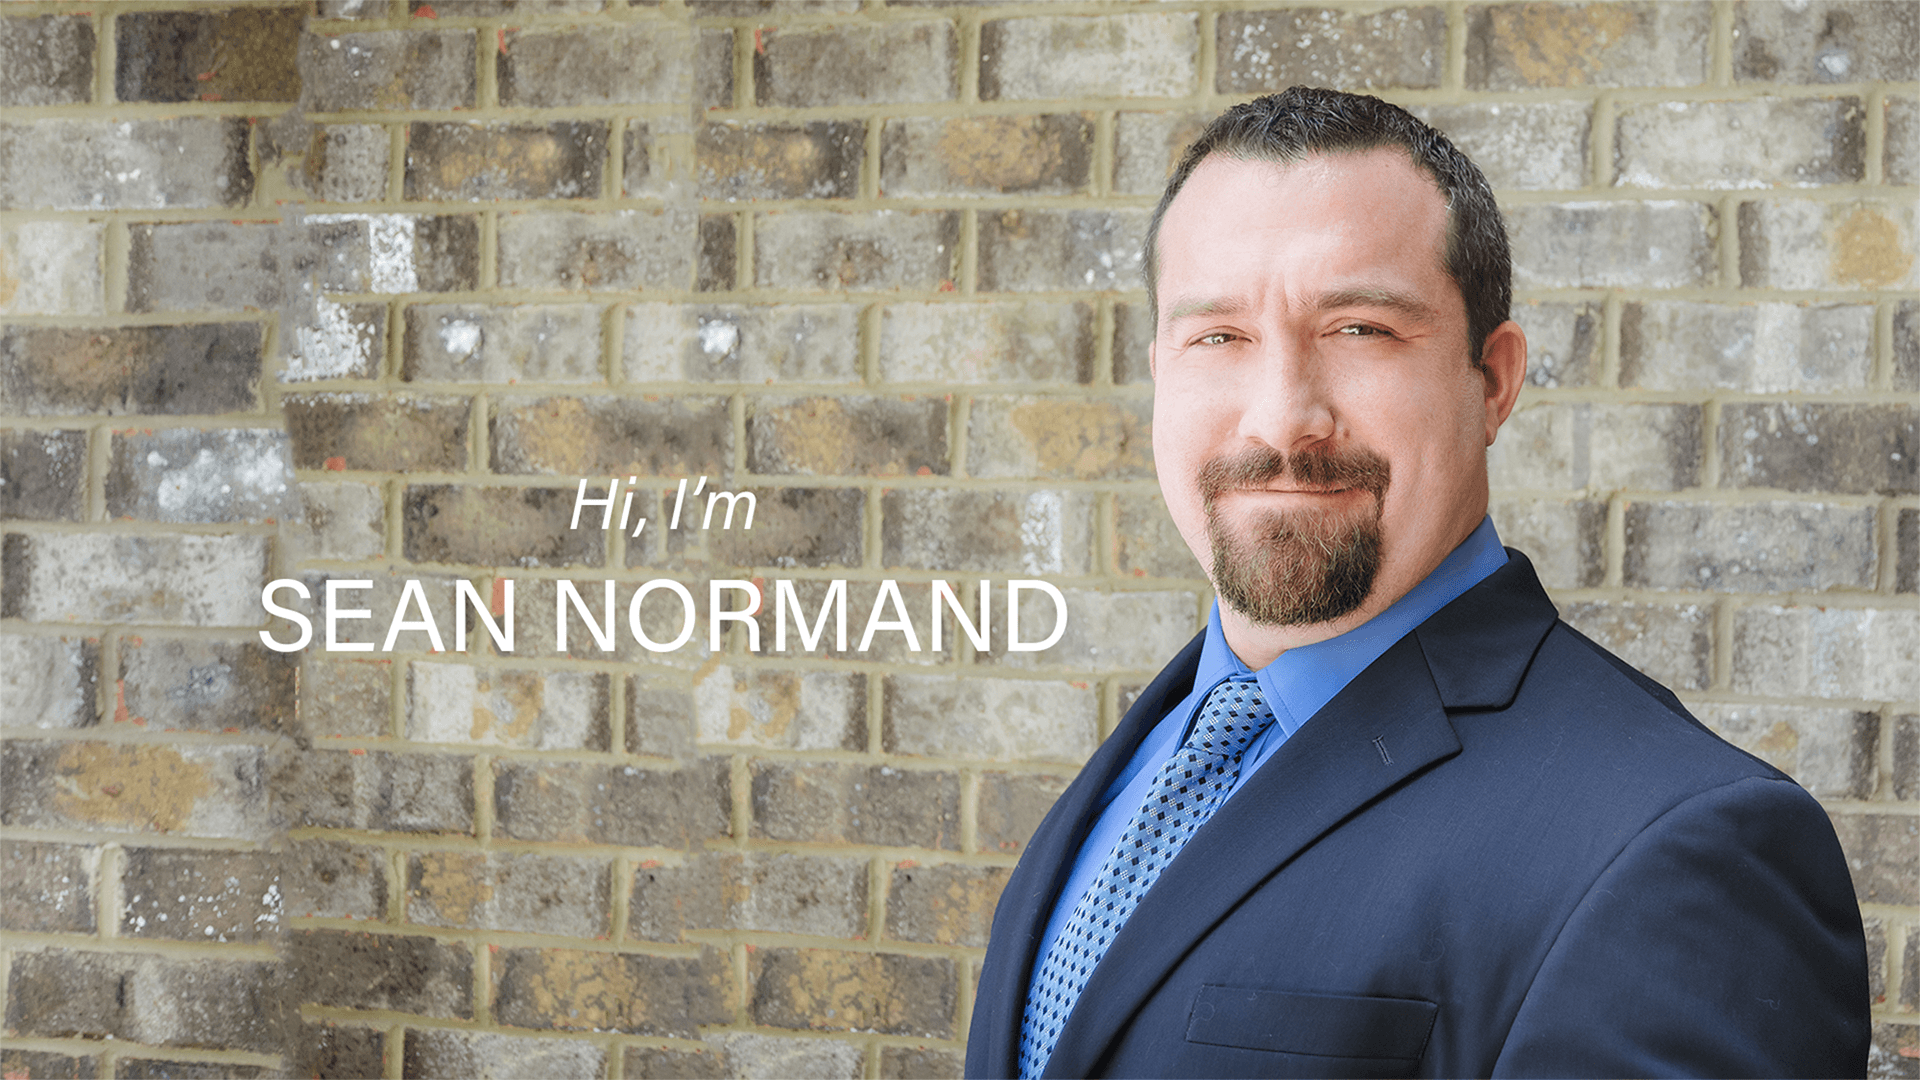 Sean Normand